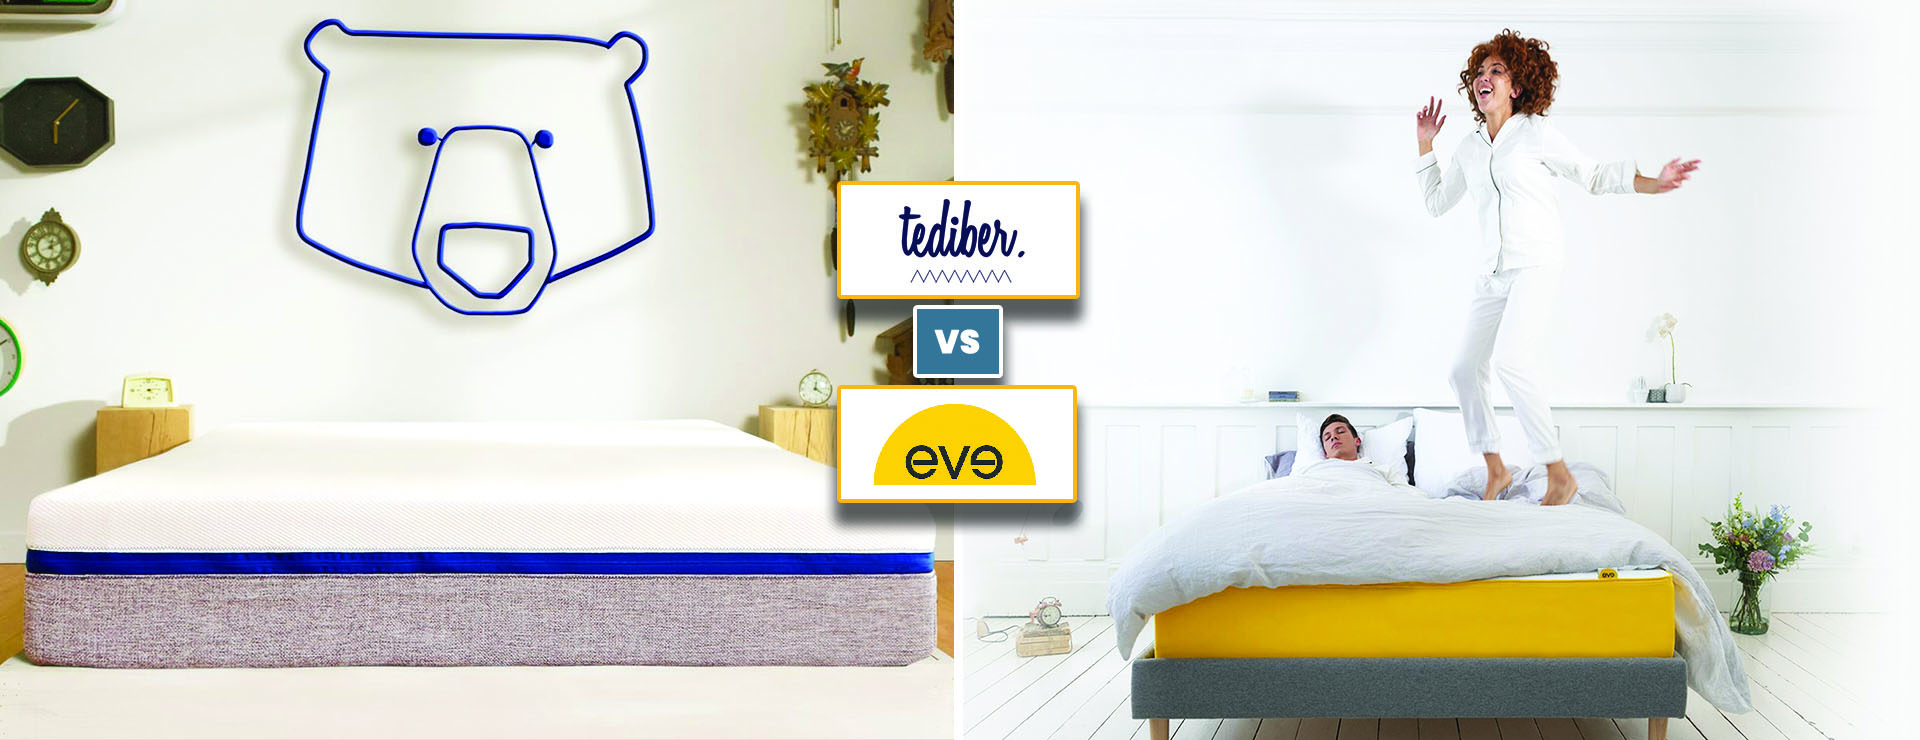 Comparatif Tediber vs Eve